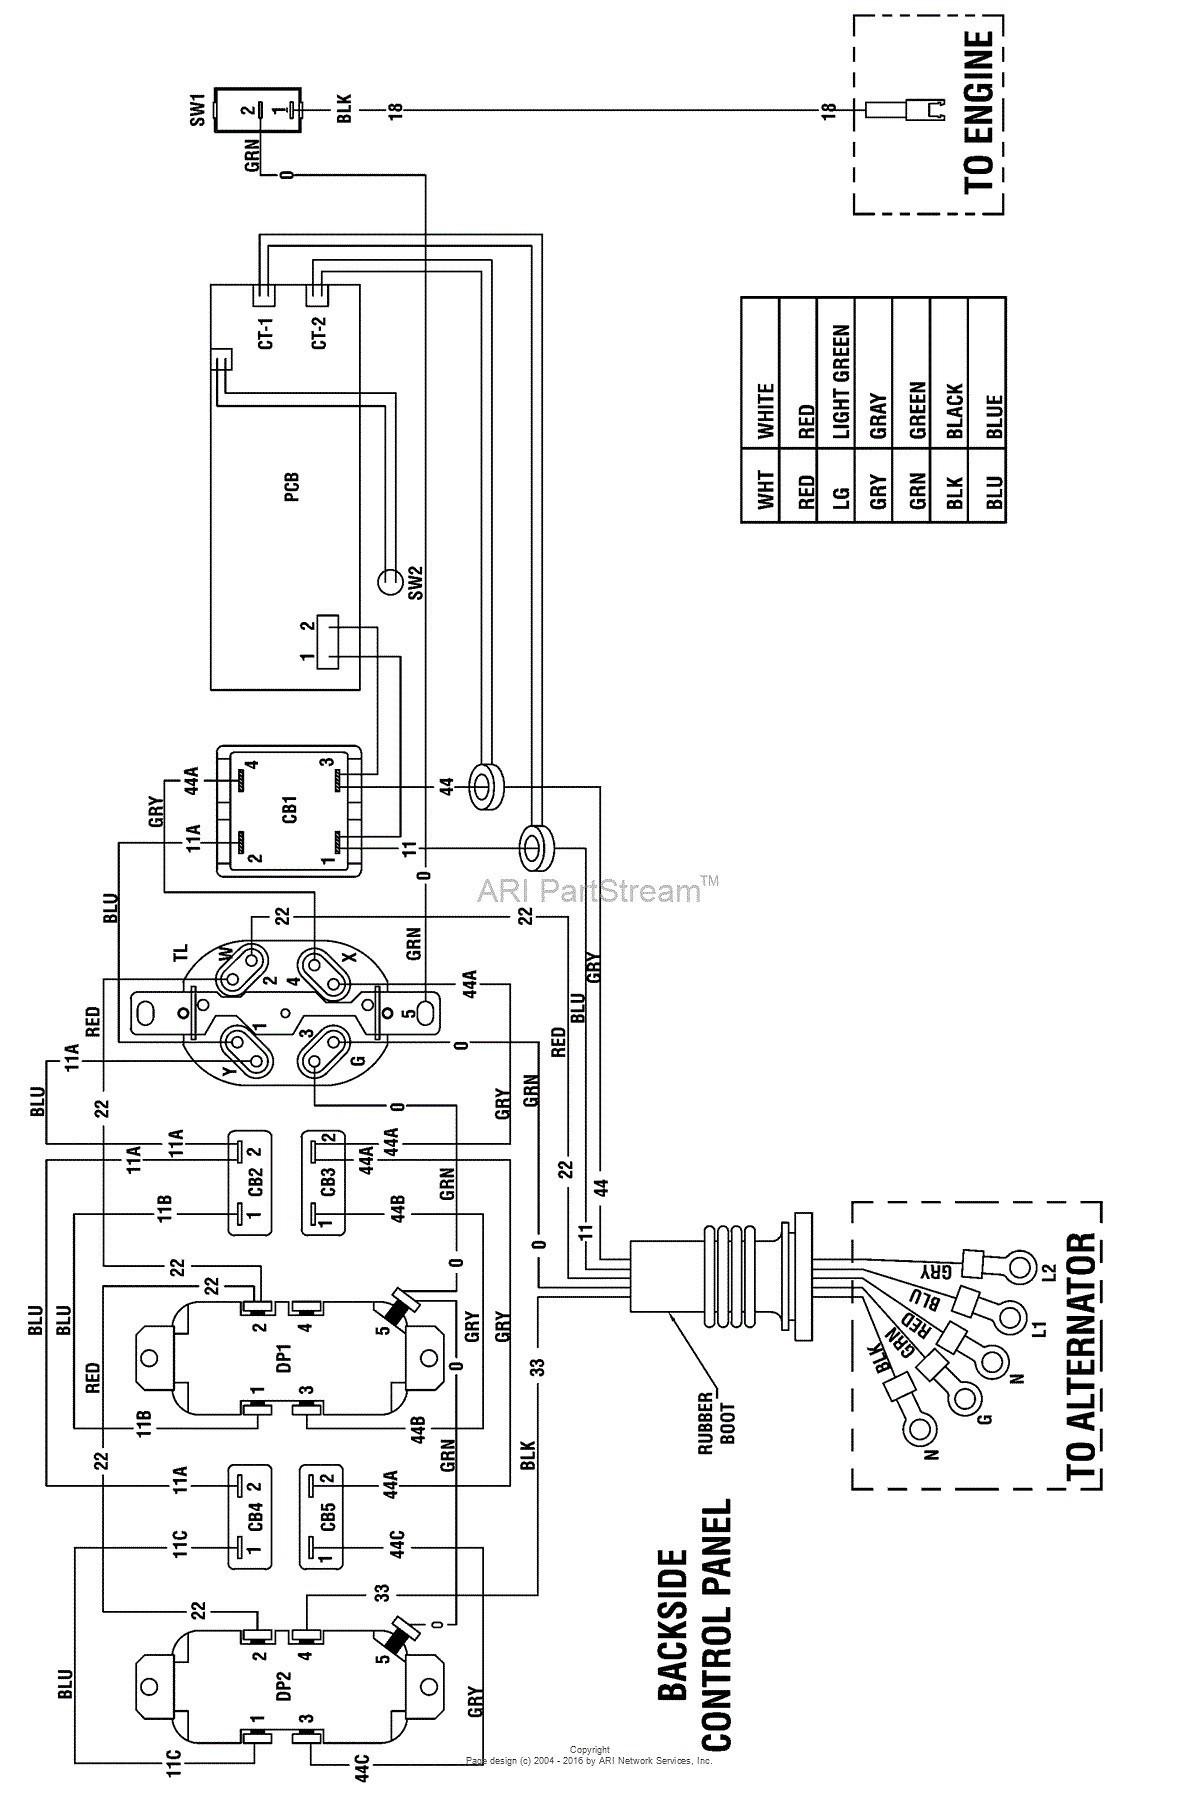 briggs and stratton alternator wiring diagram new wiring diagram briggs stratton engine archives gidn co best of briggs and stratton alternator wiring diagram